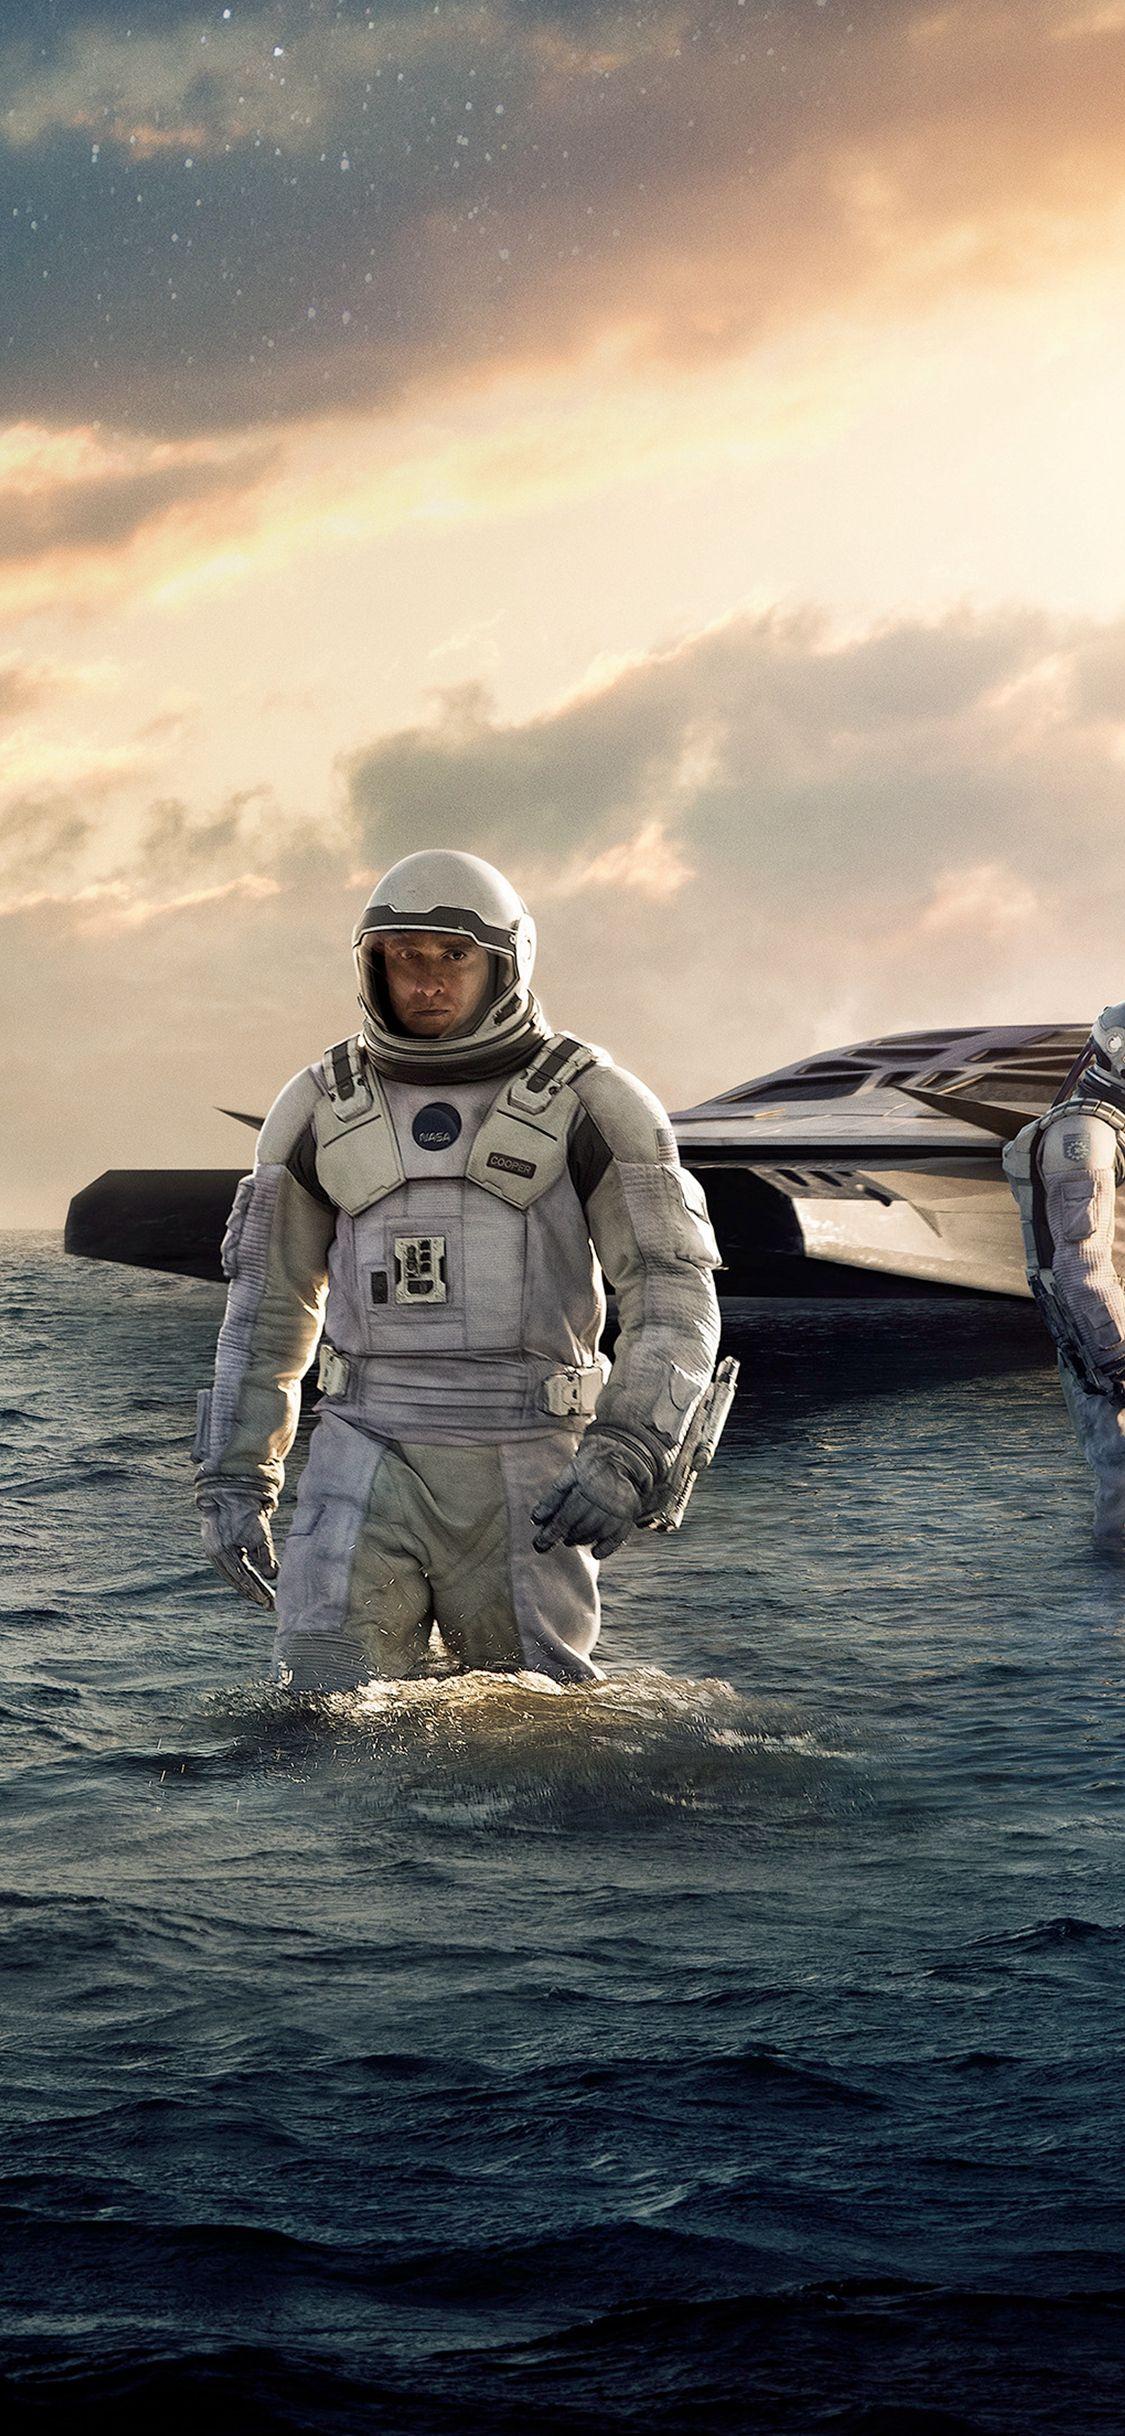 Interstellar Sea Film Space Art Iphone X Wallpaper Interstellar Interstellar Movie Space Art